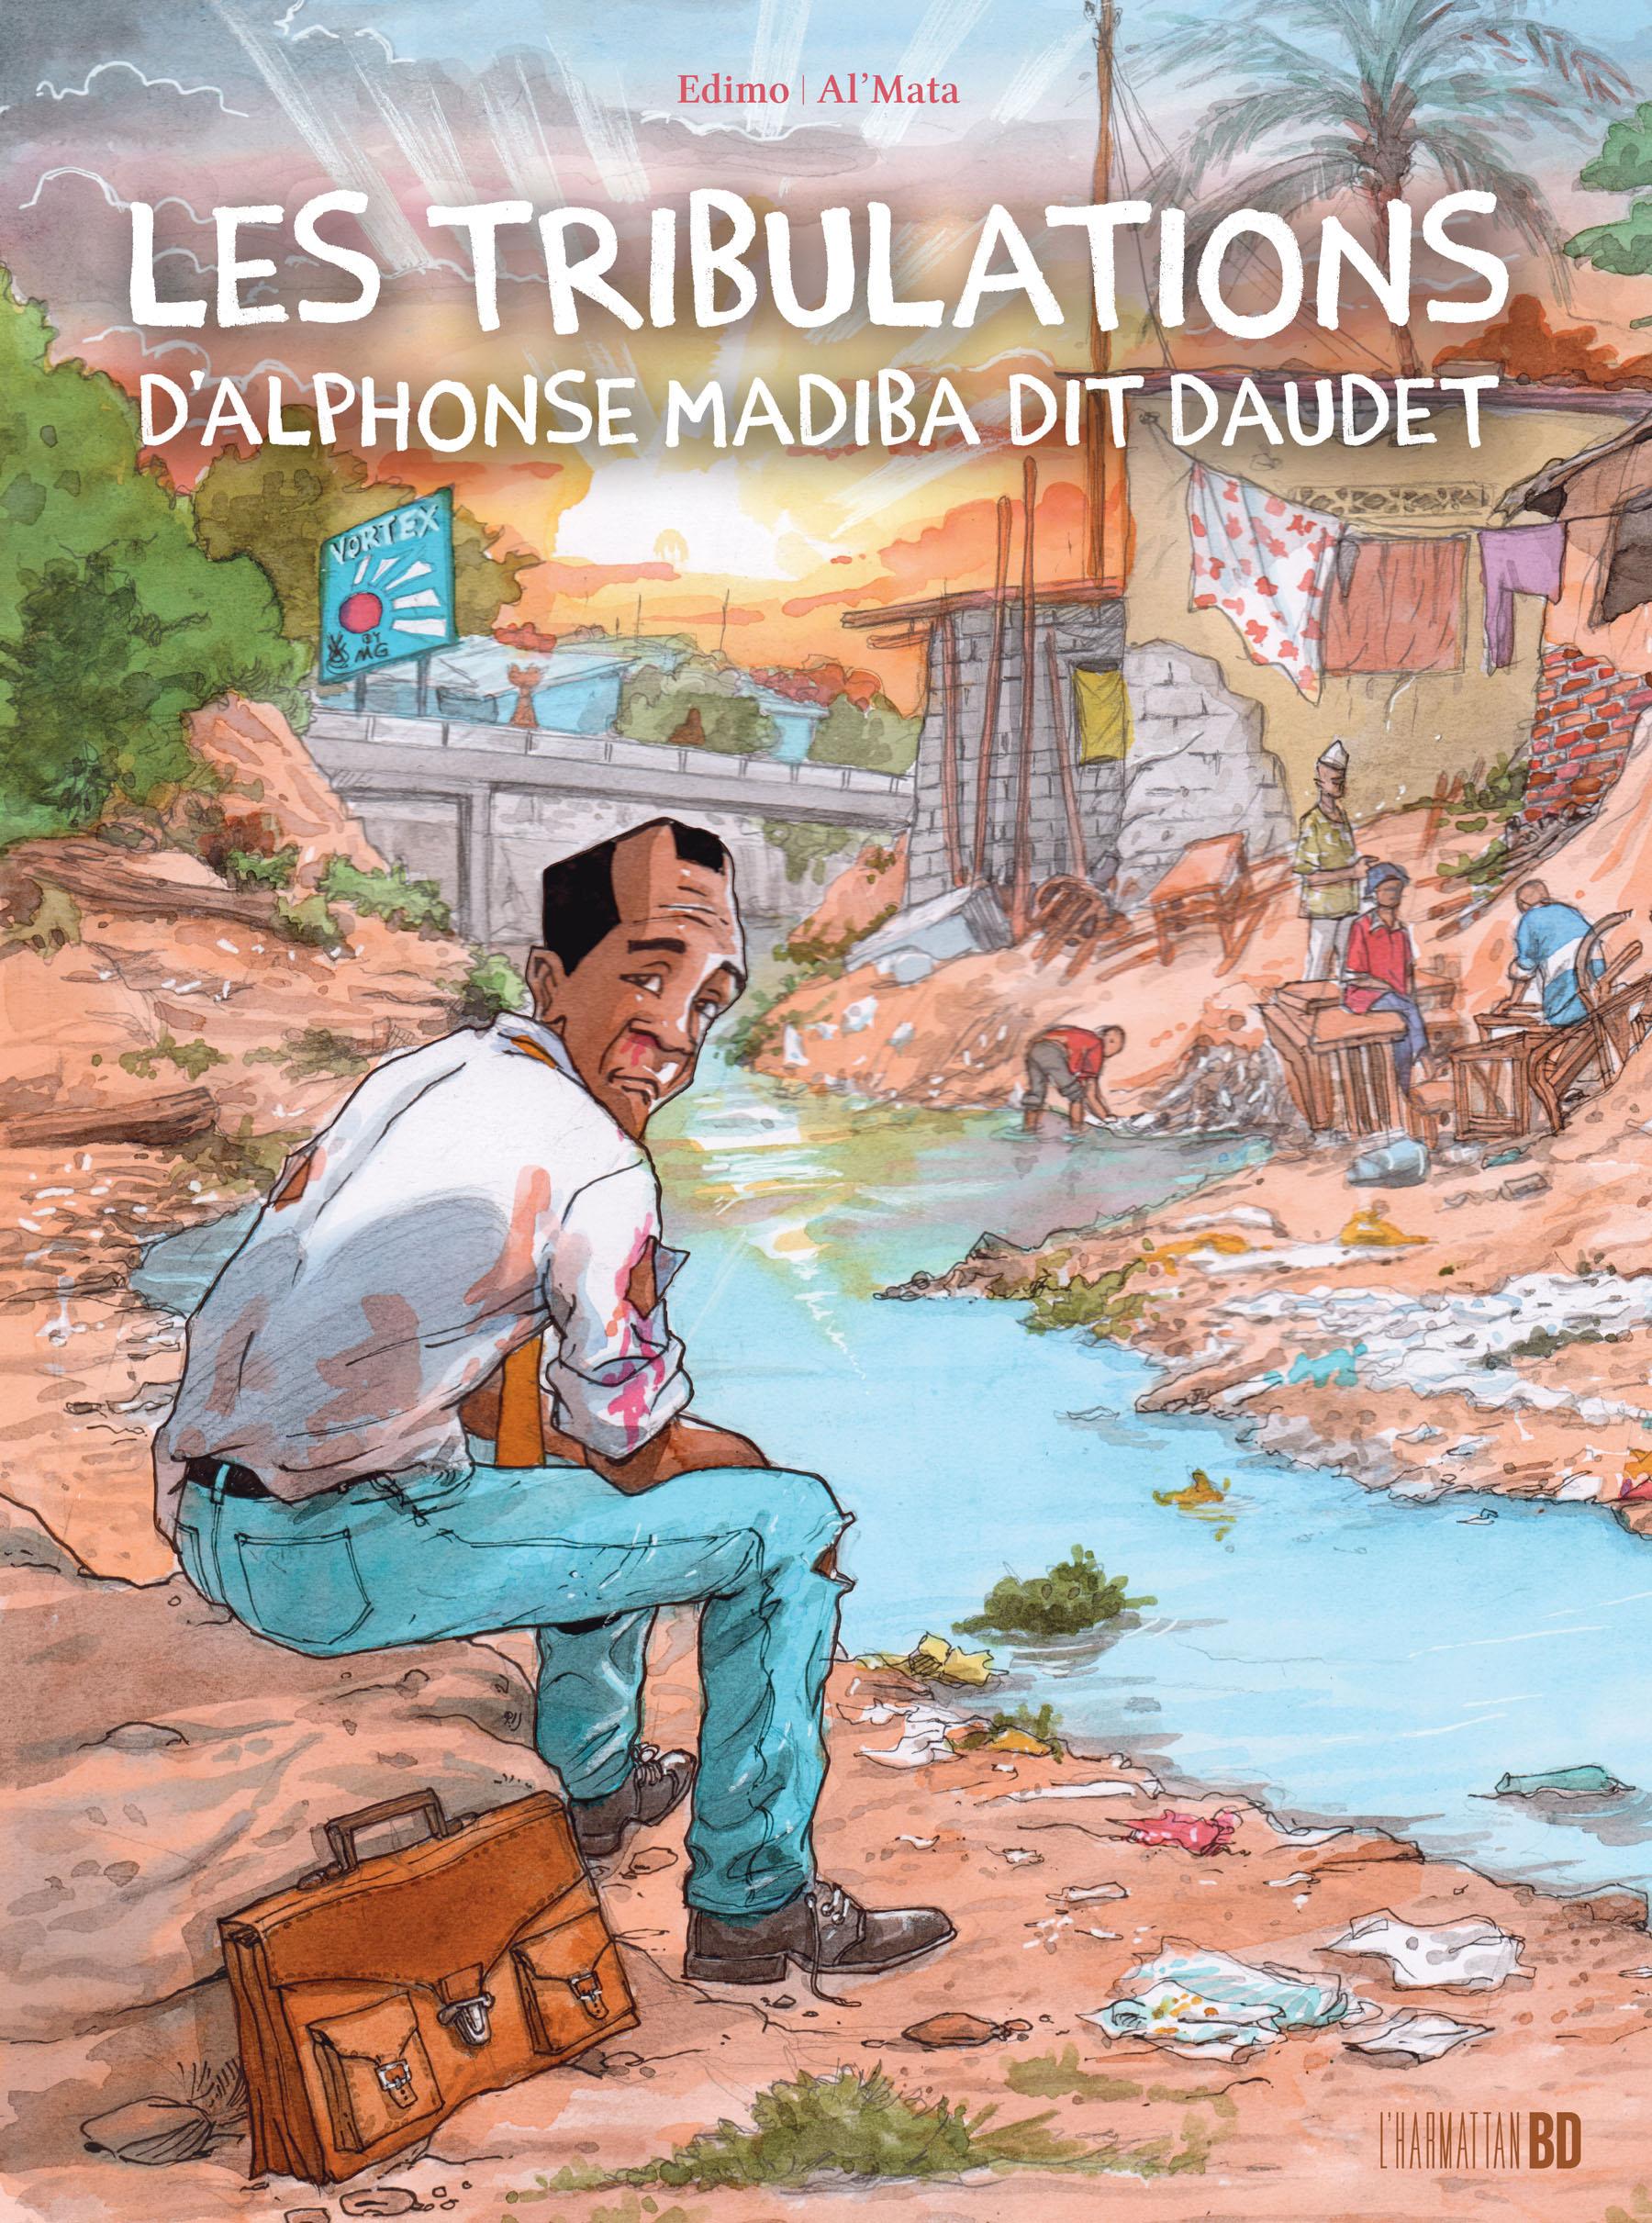 Alphonse Madiba